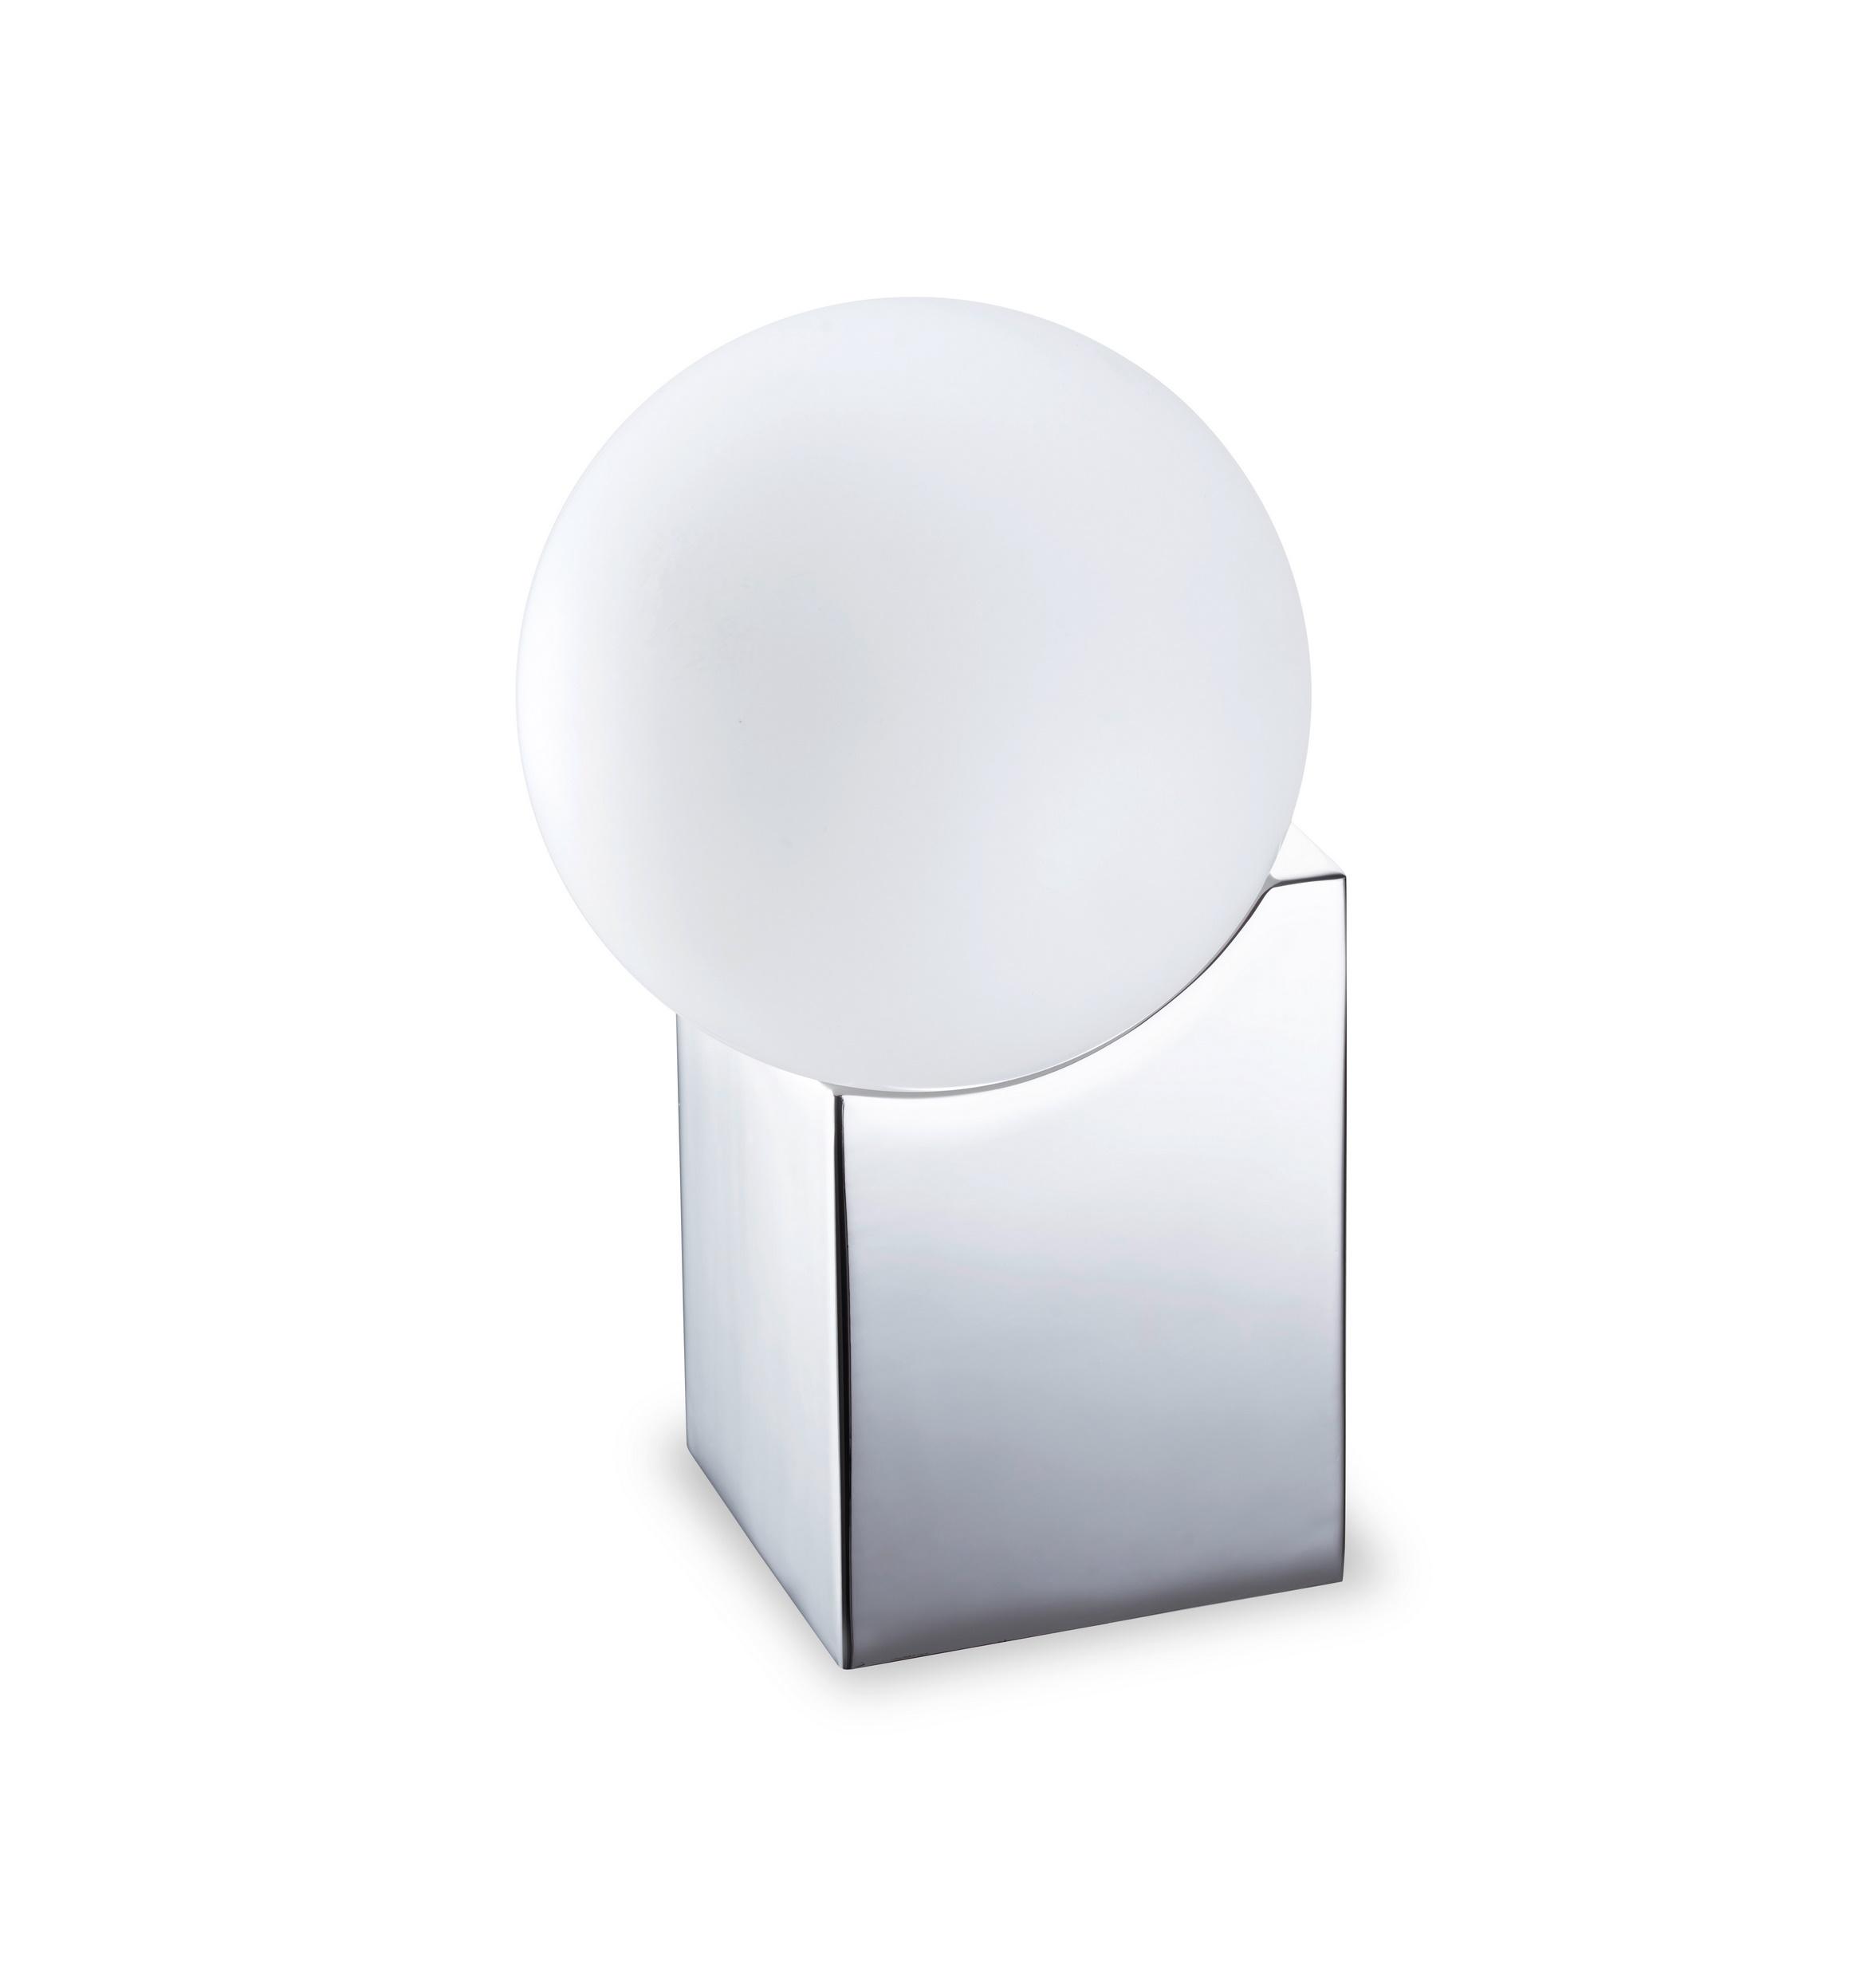 Cub Sobremesa pequeño G-9 LED Acero y cristal 17,5cm